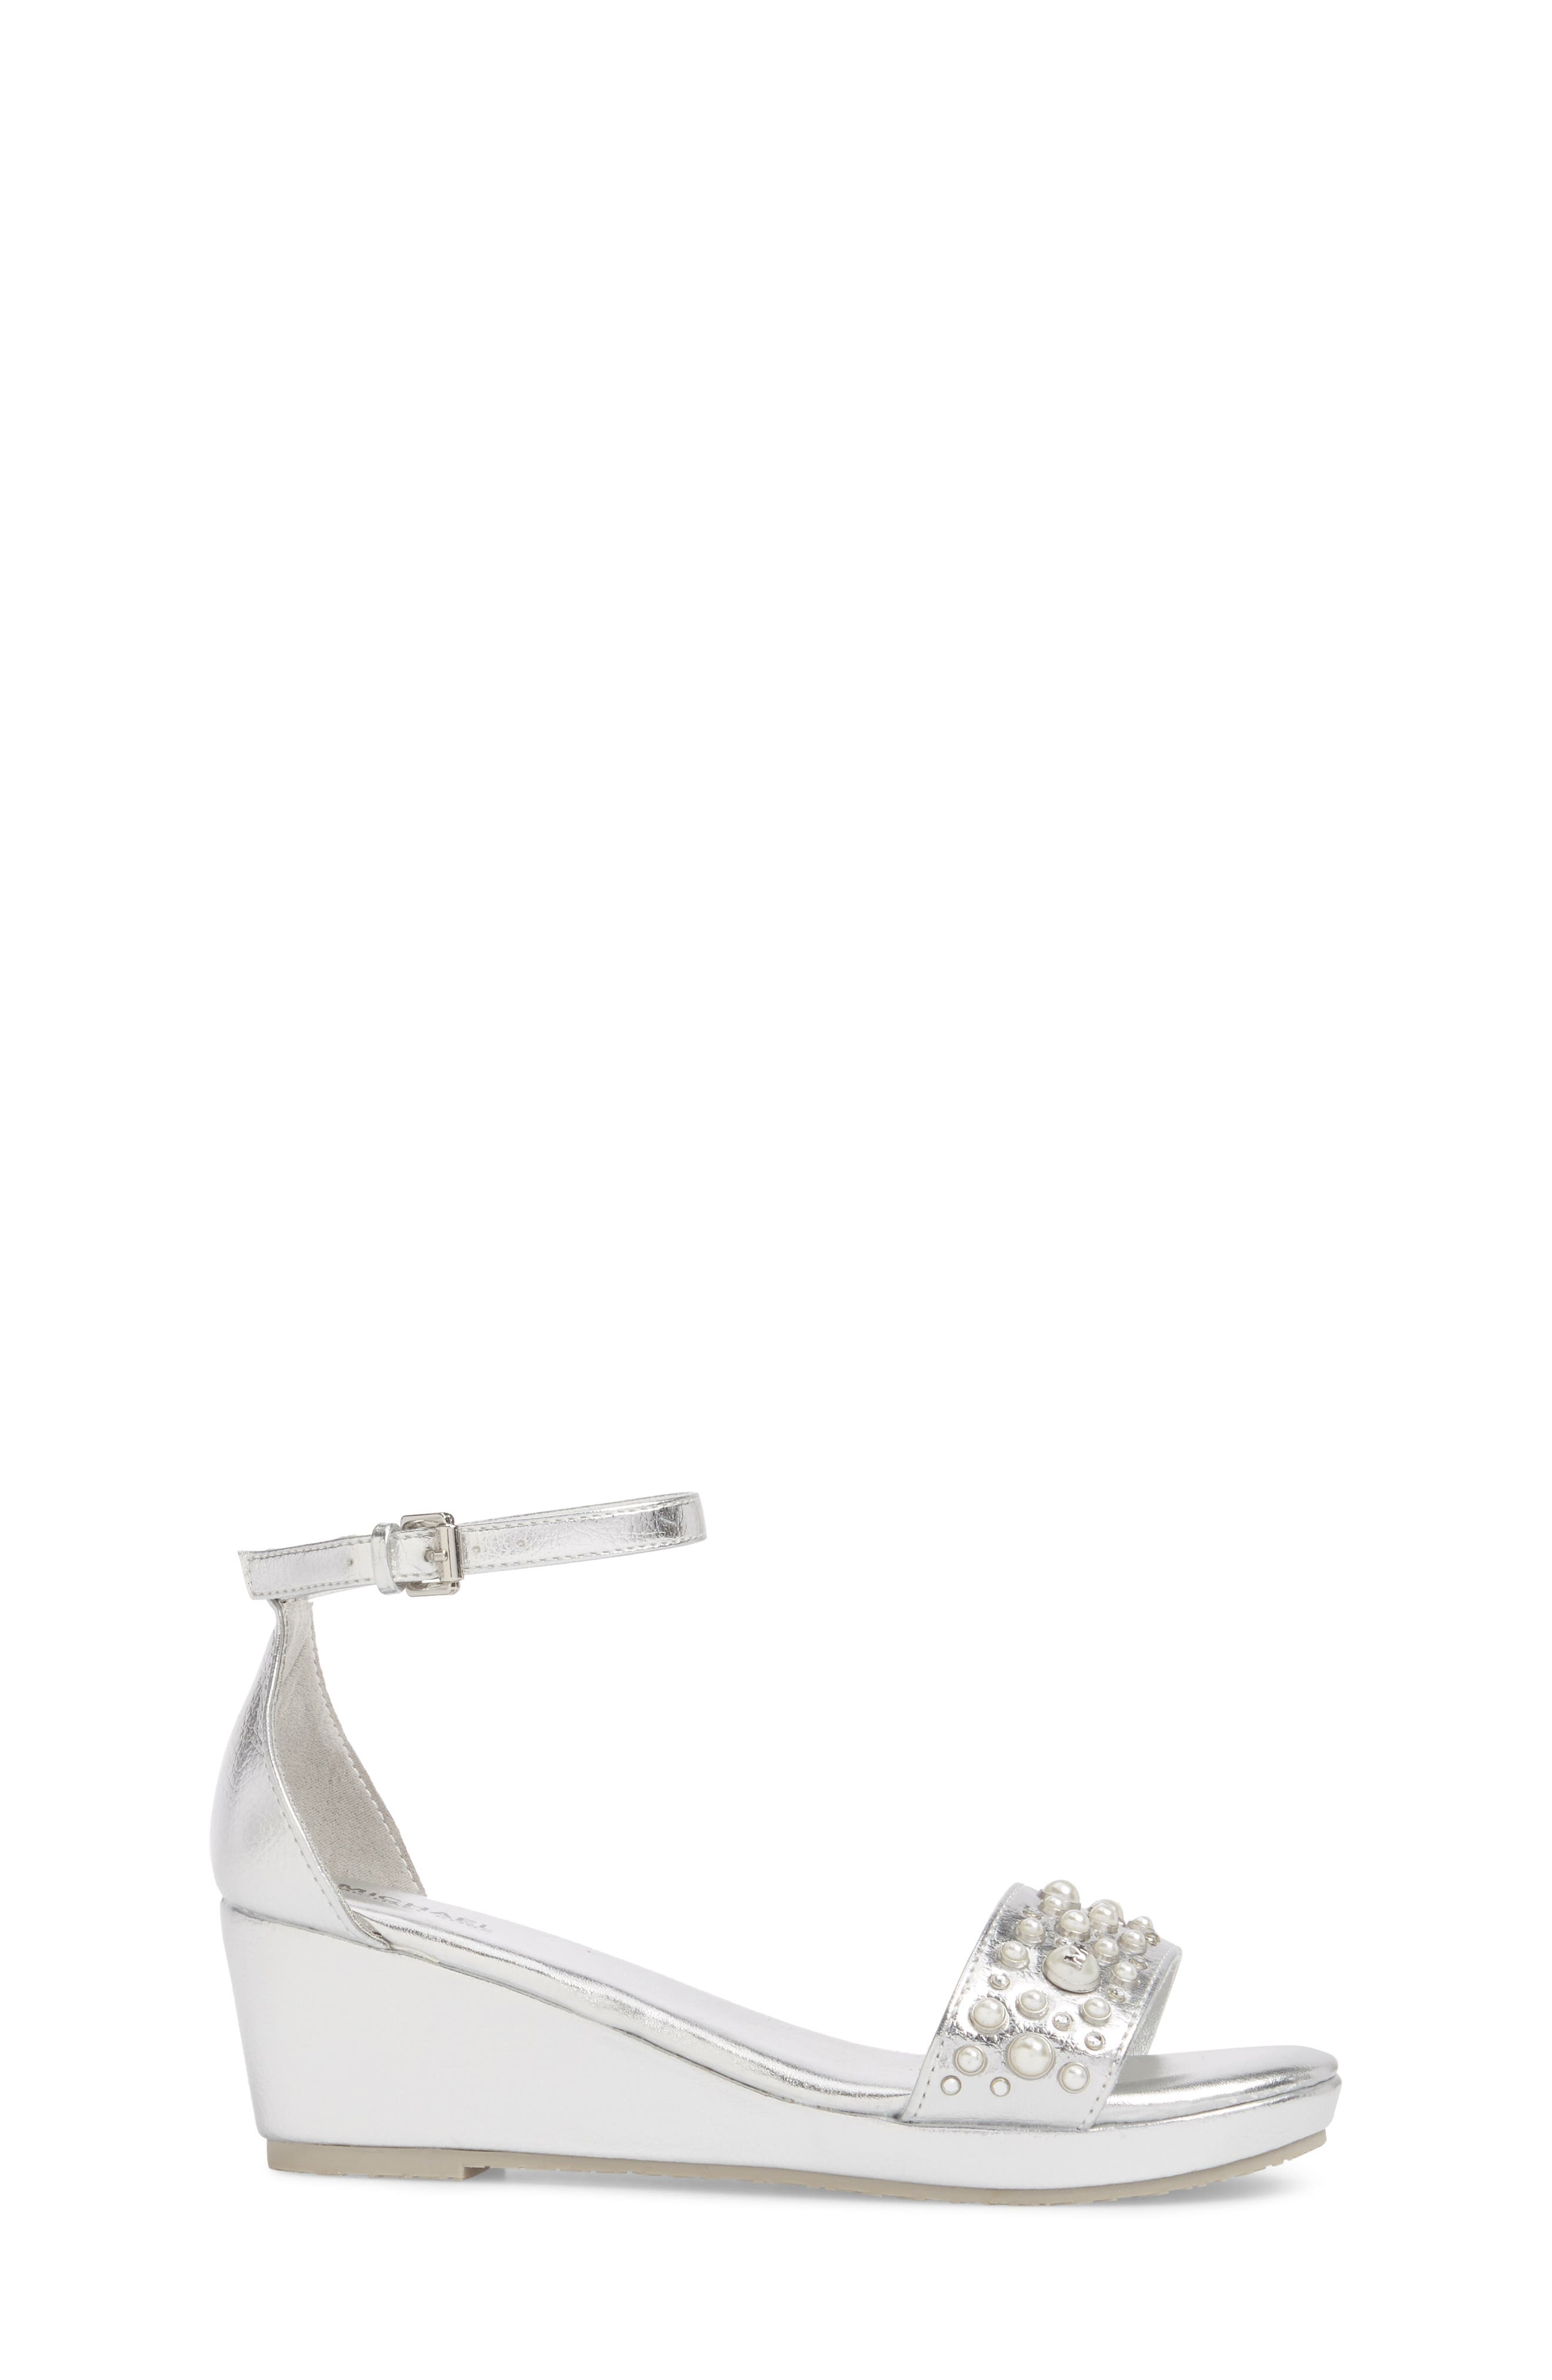 Cate Embellished Wedge Sandal,                             Alternate thumbnail 3, color,